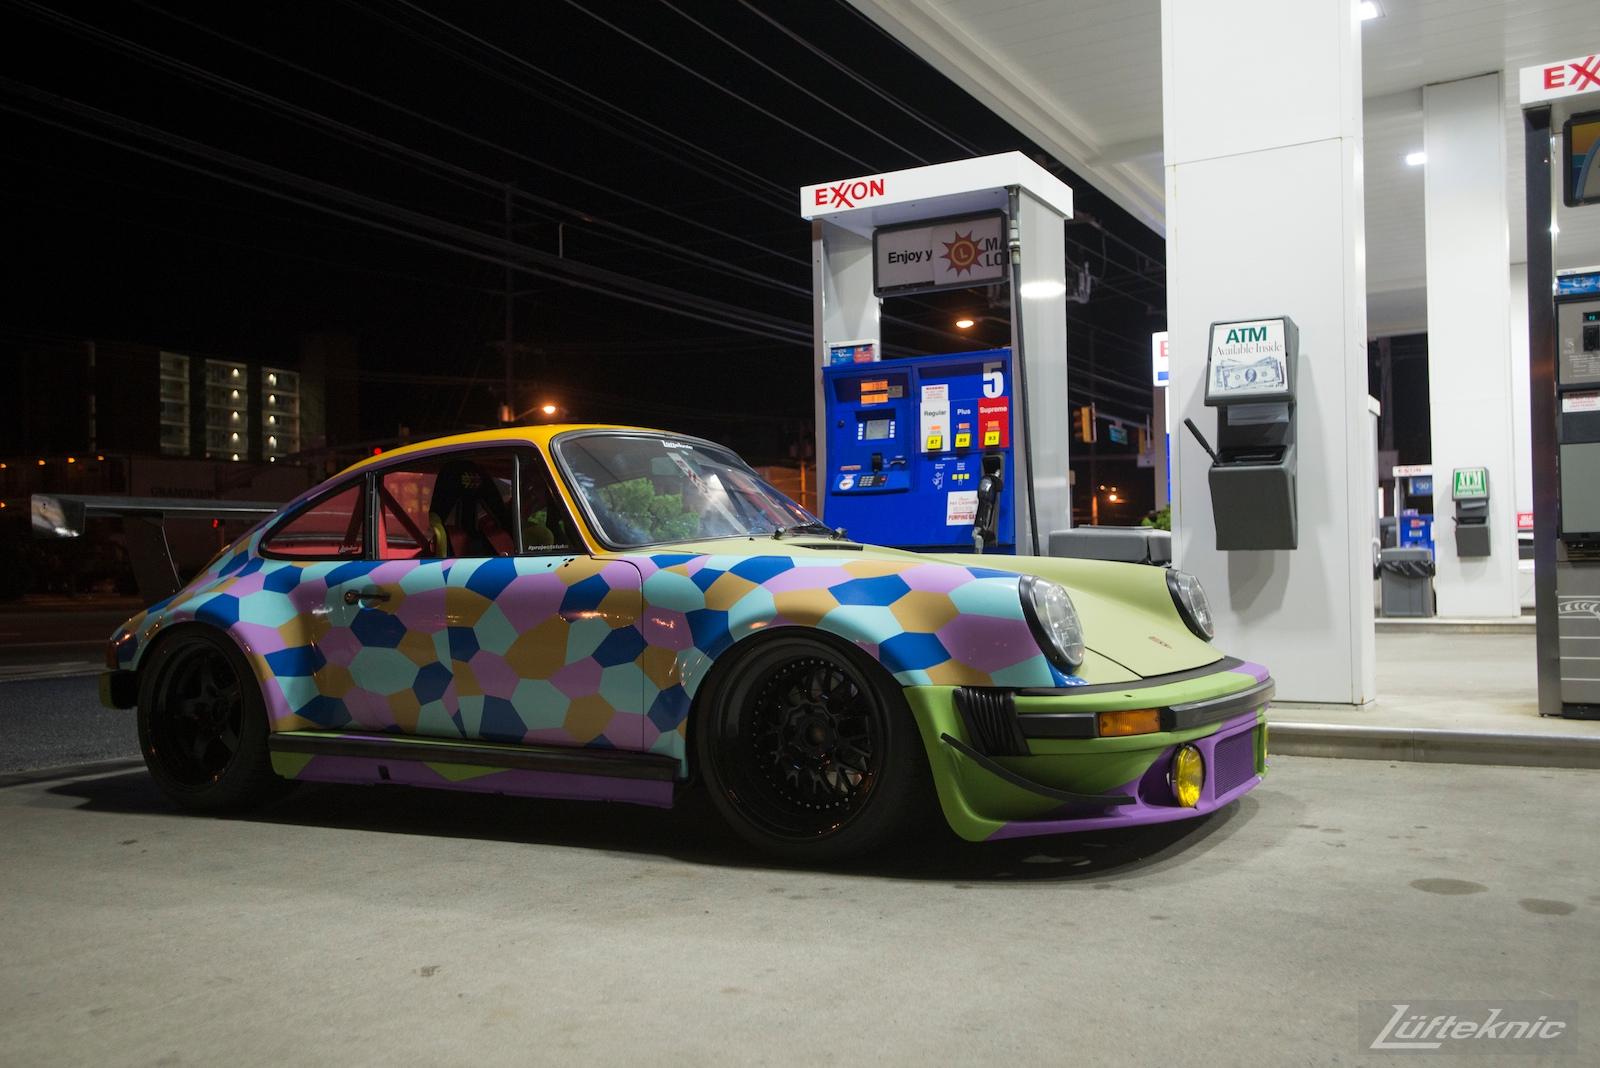 The Lüfteknic #projectstuka Porsche 930 Turbo with exxon gas pump.